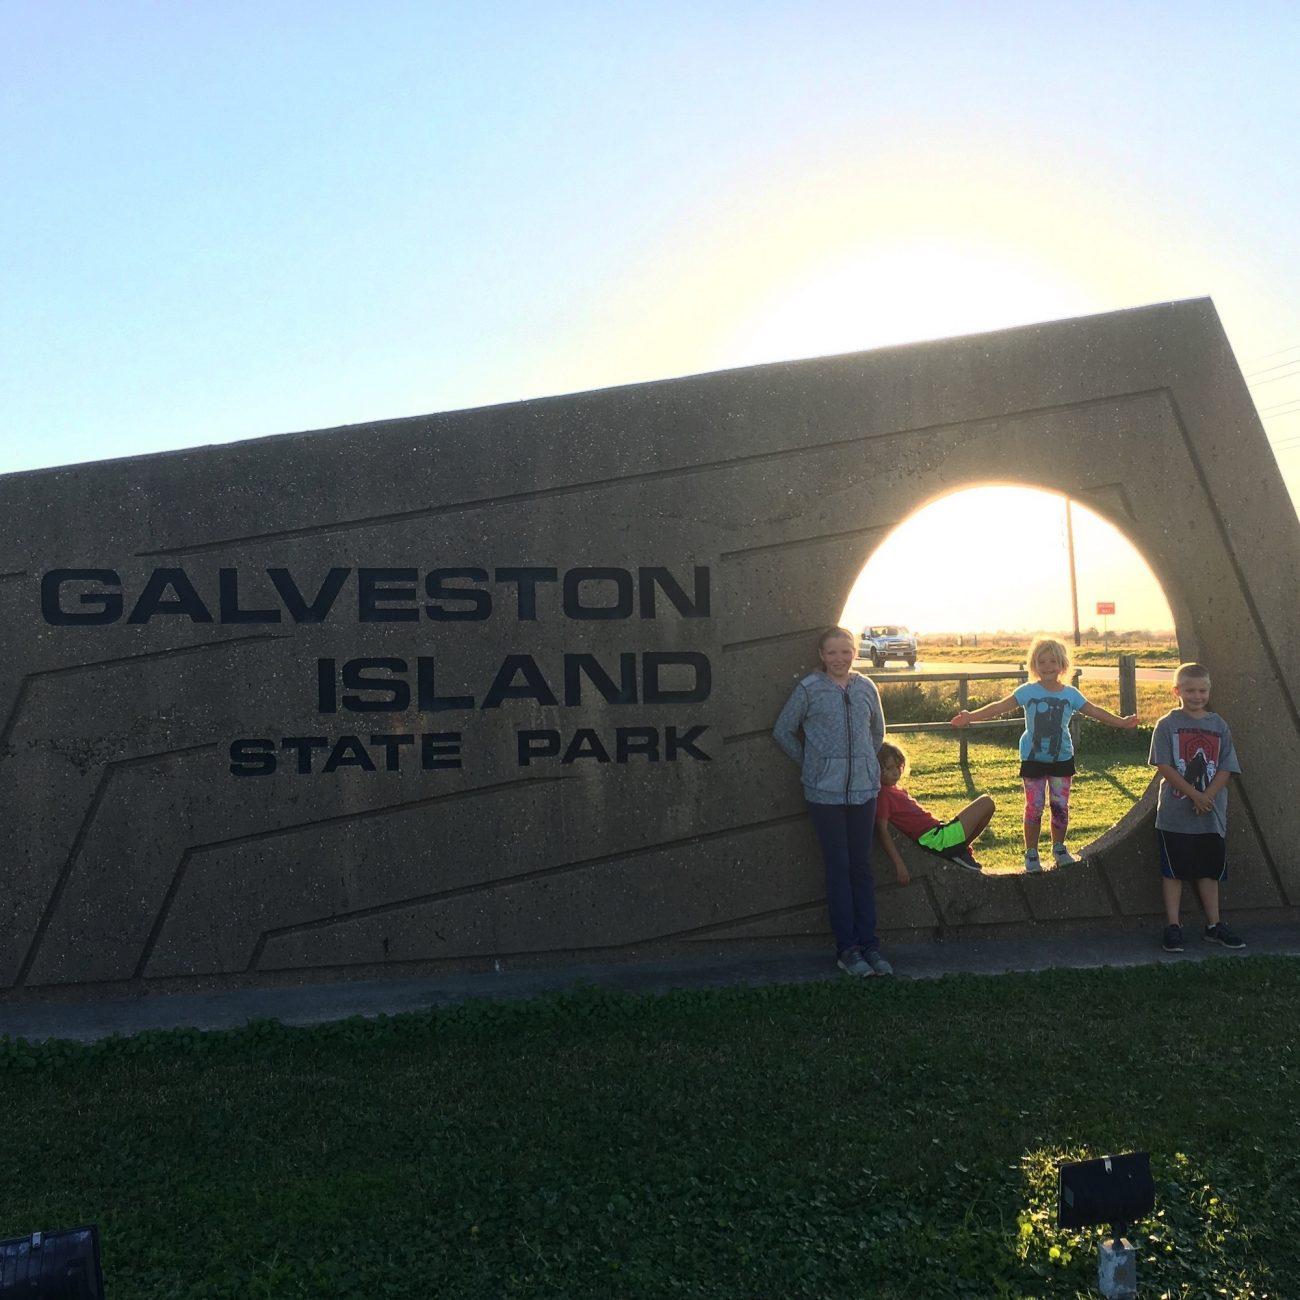 Kids at Galveston Island Sign